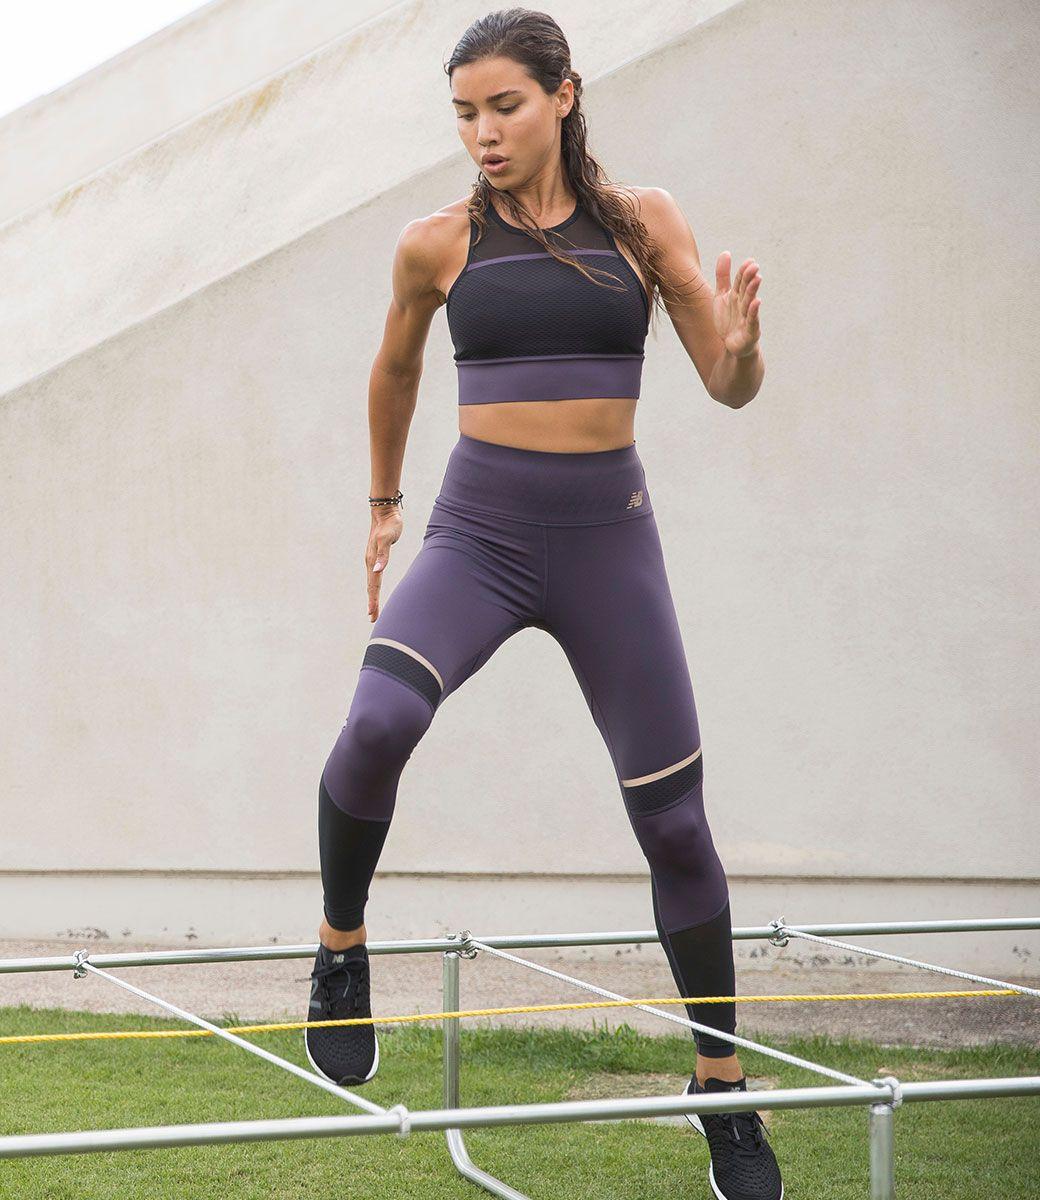 New Balance Women's Performance Look Q118,